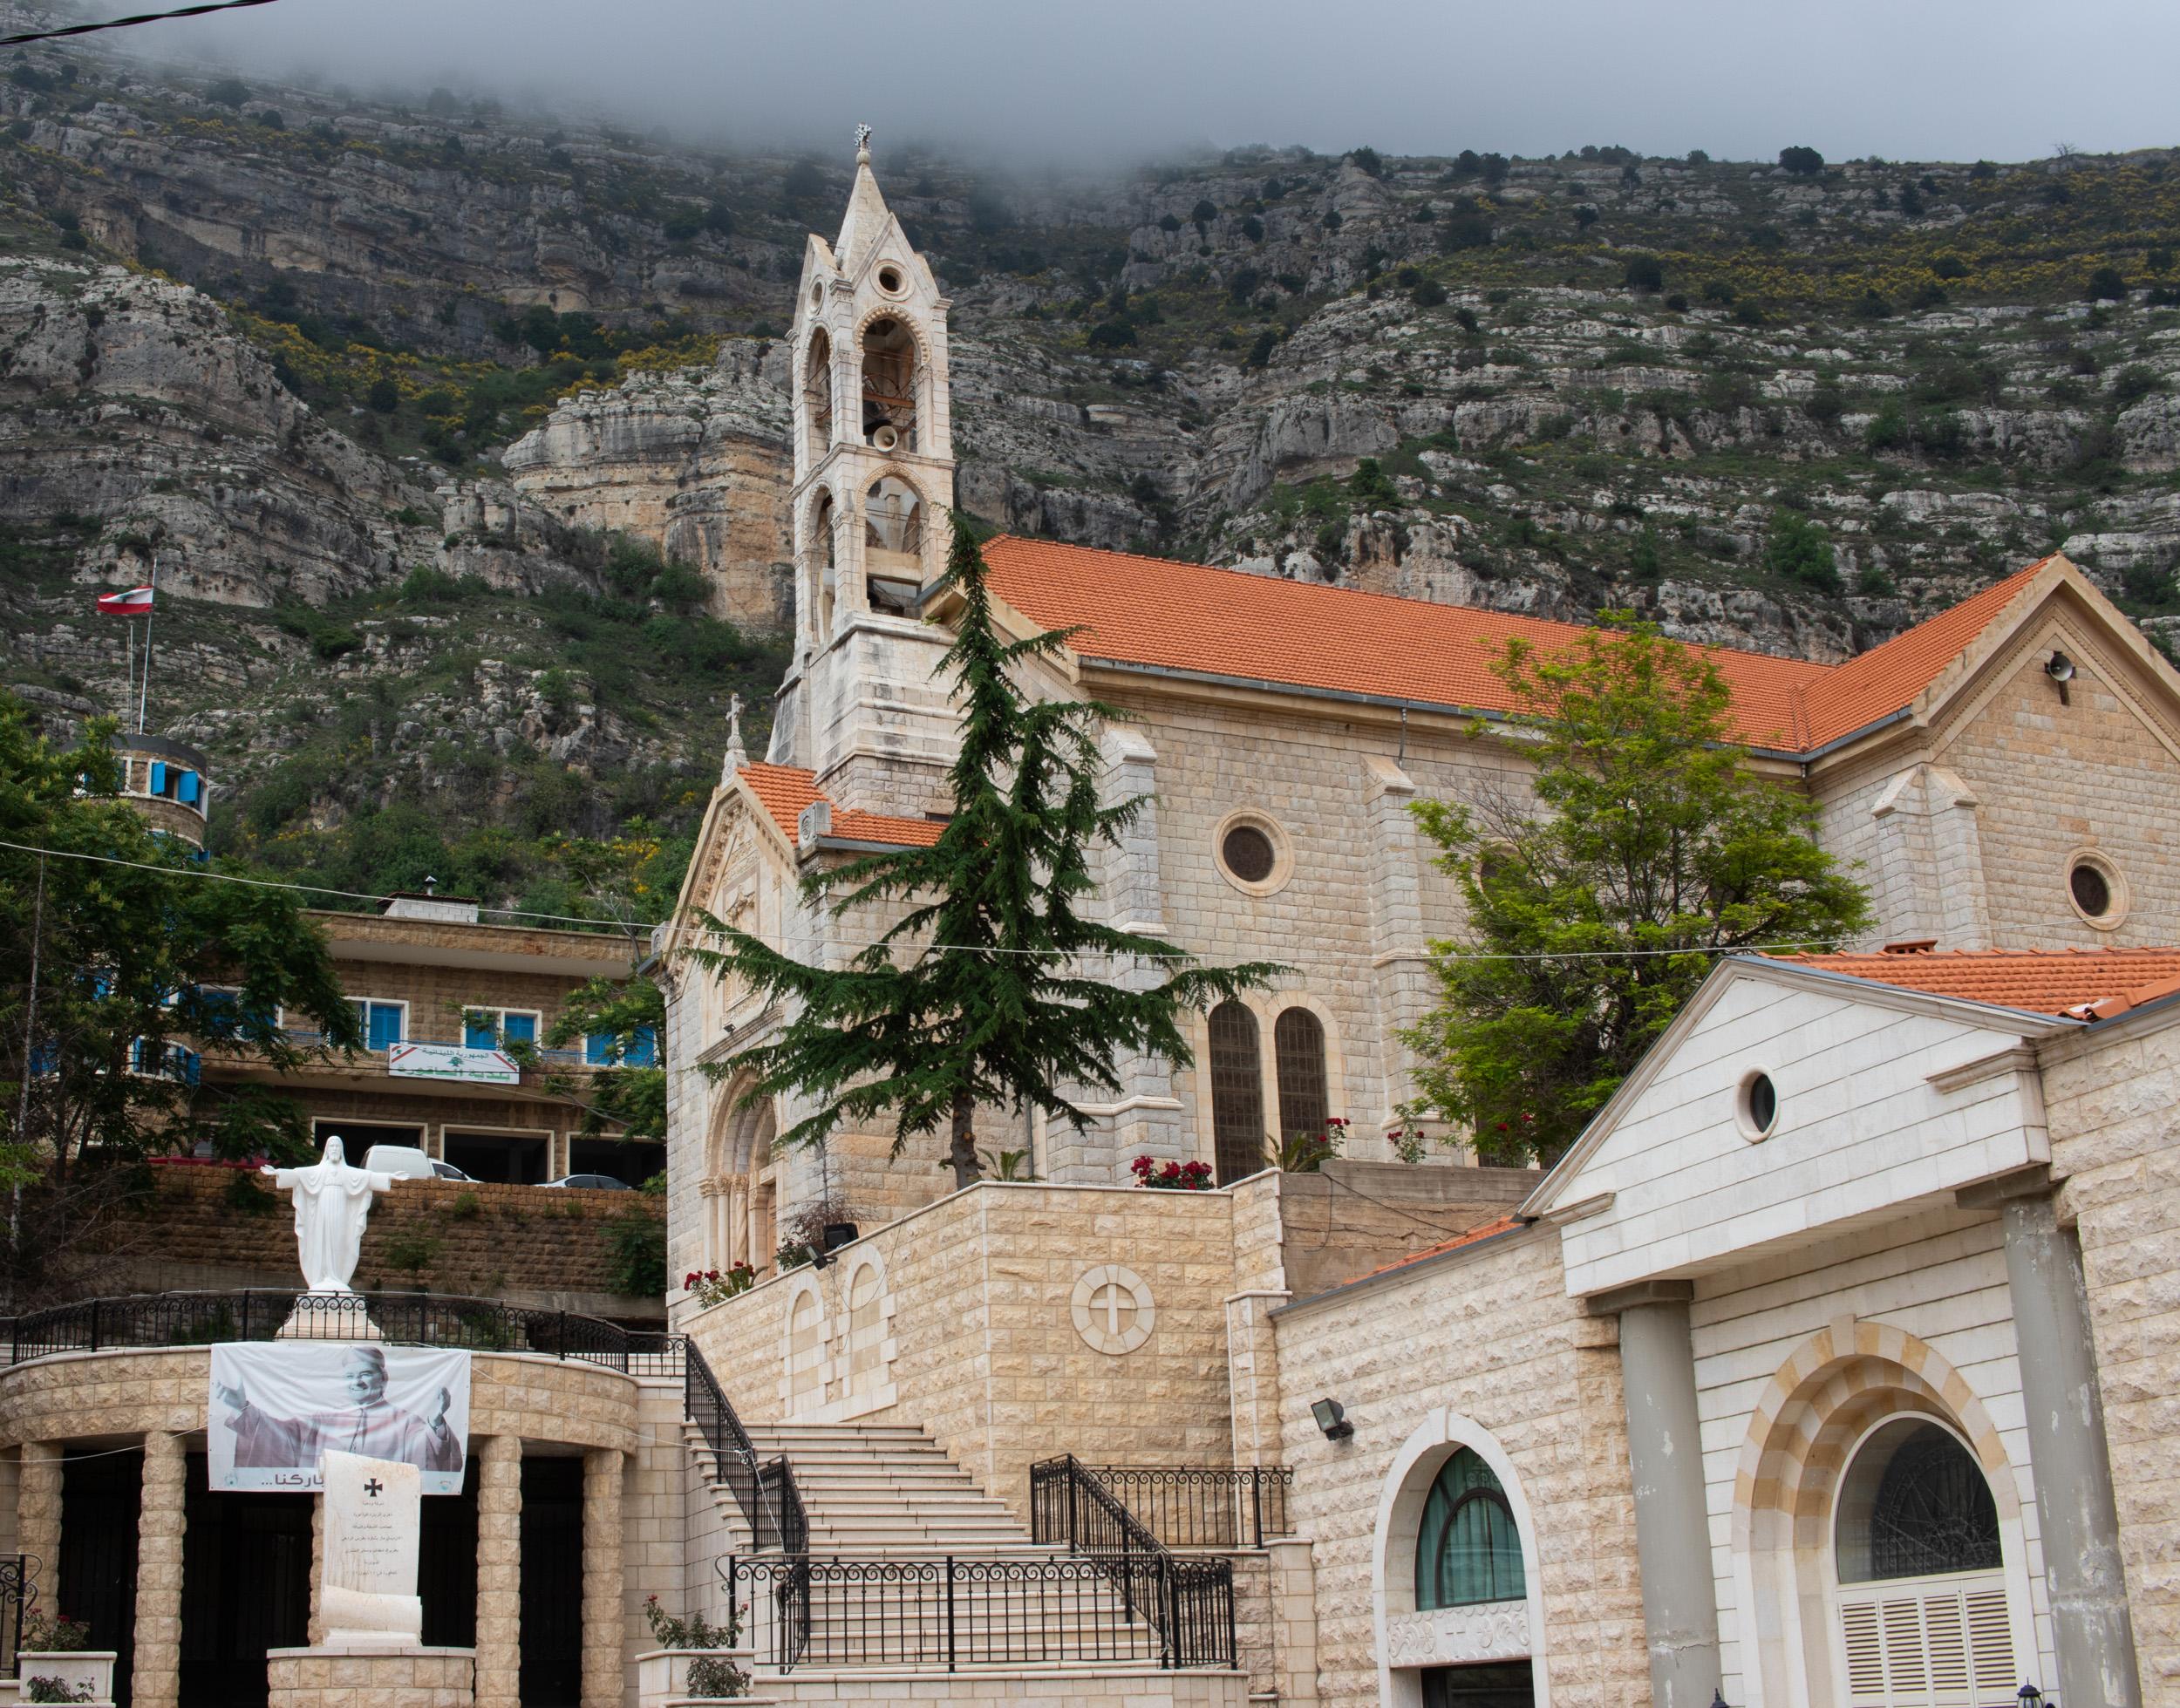 St. George's, Aqoura